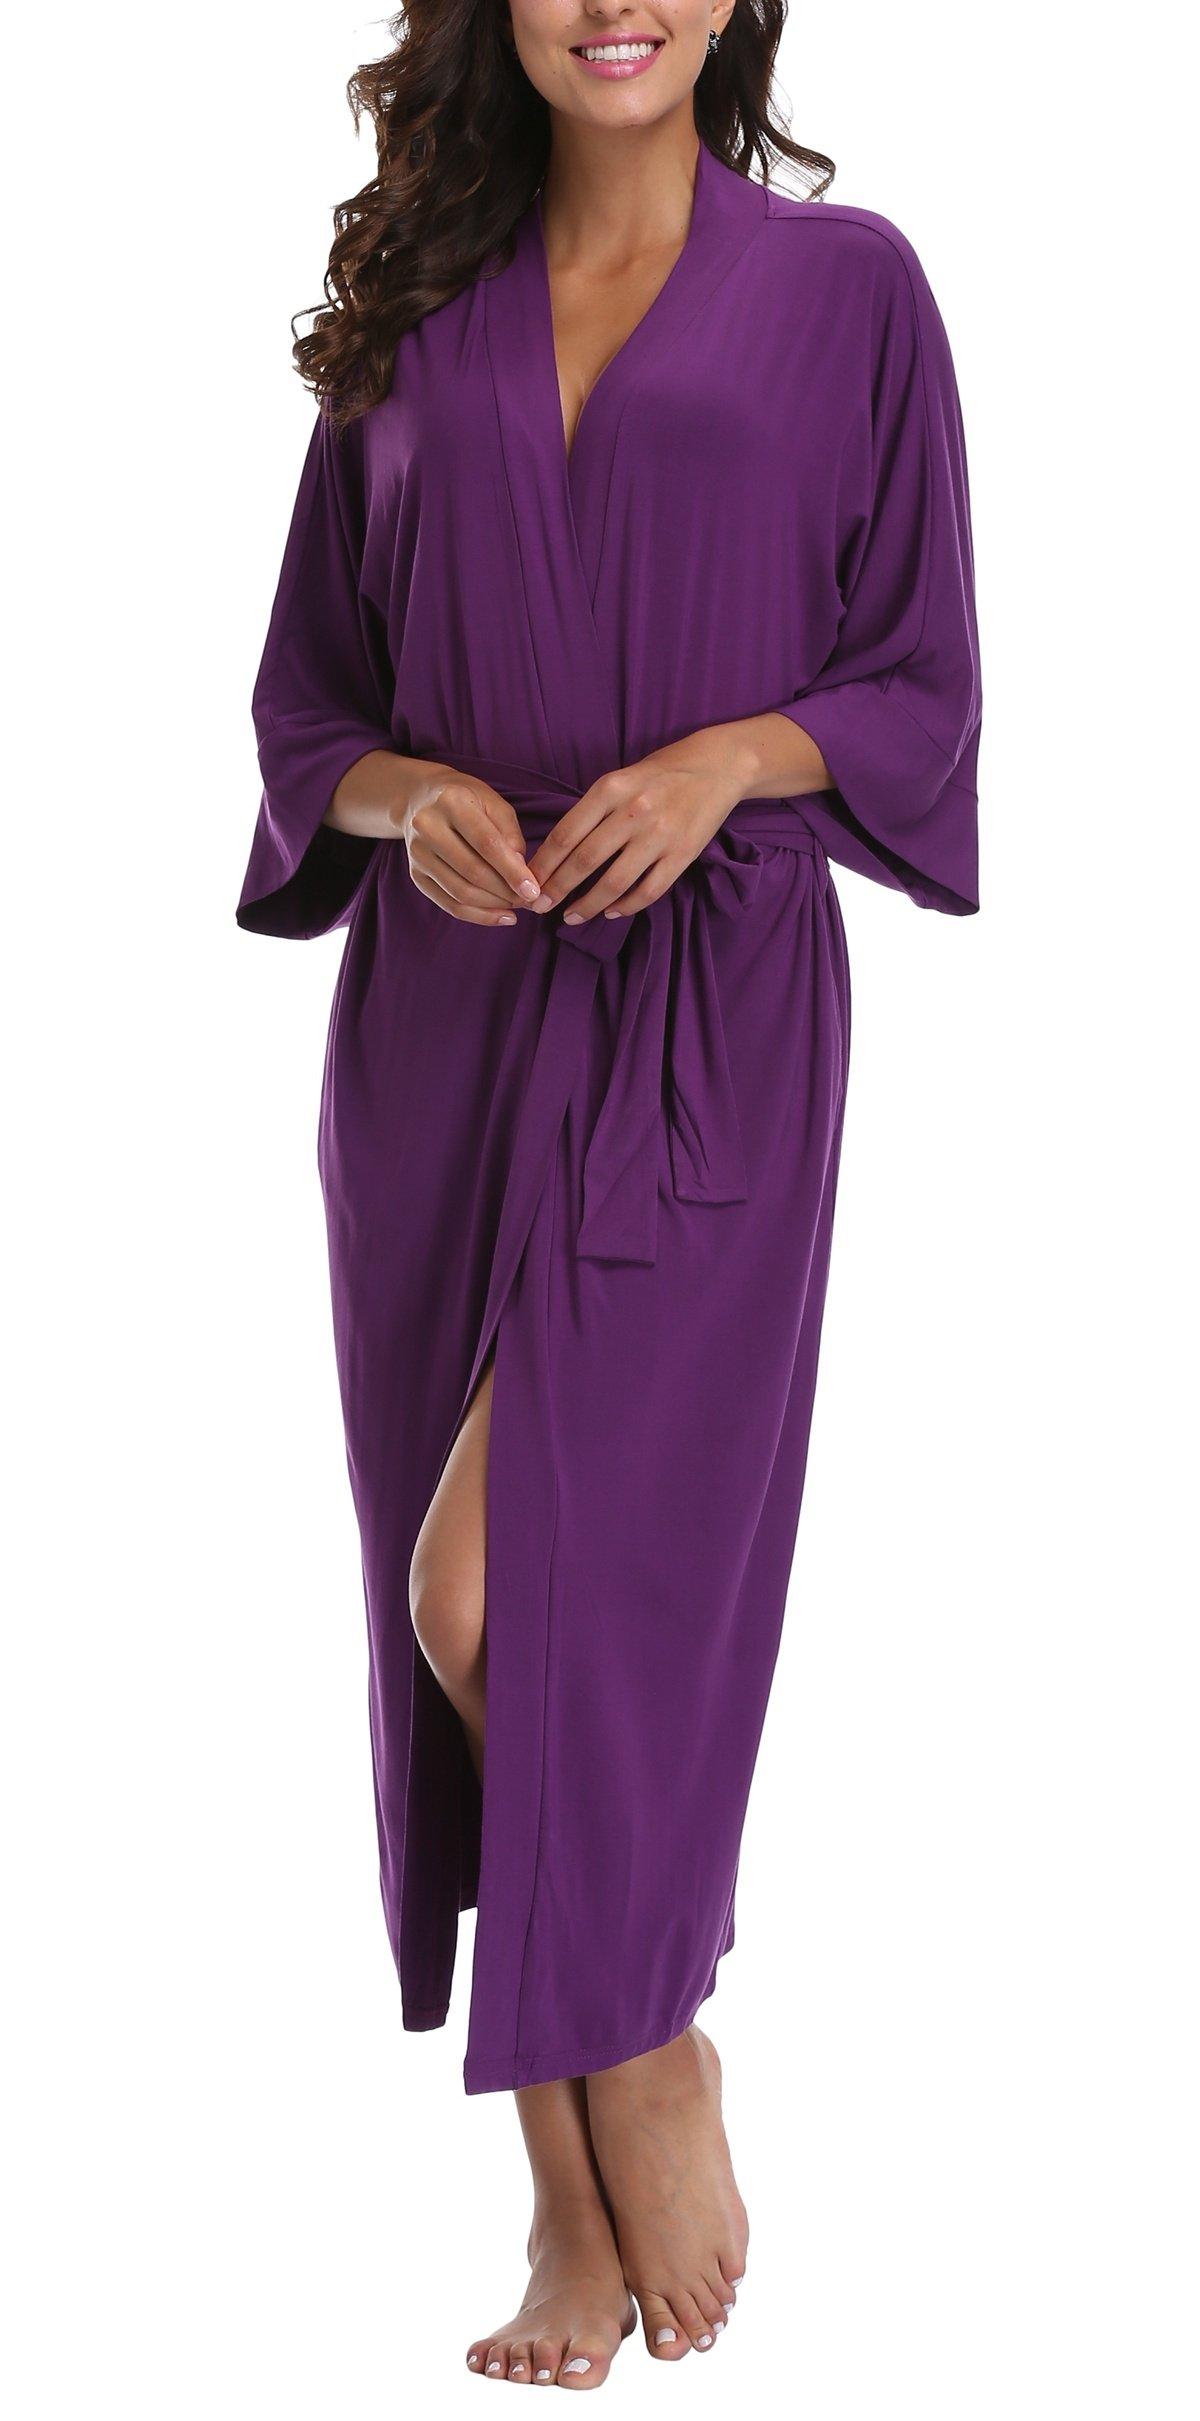 WitBuy Women's Soft Long Modal Cotton Robe Pure Knit Bathrobe V-Neck Nightgown Purple M